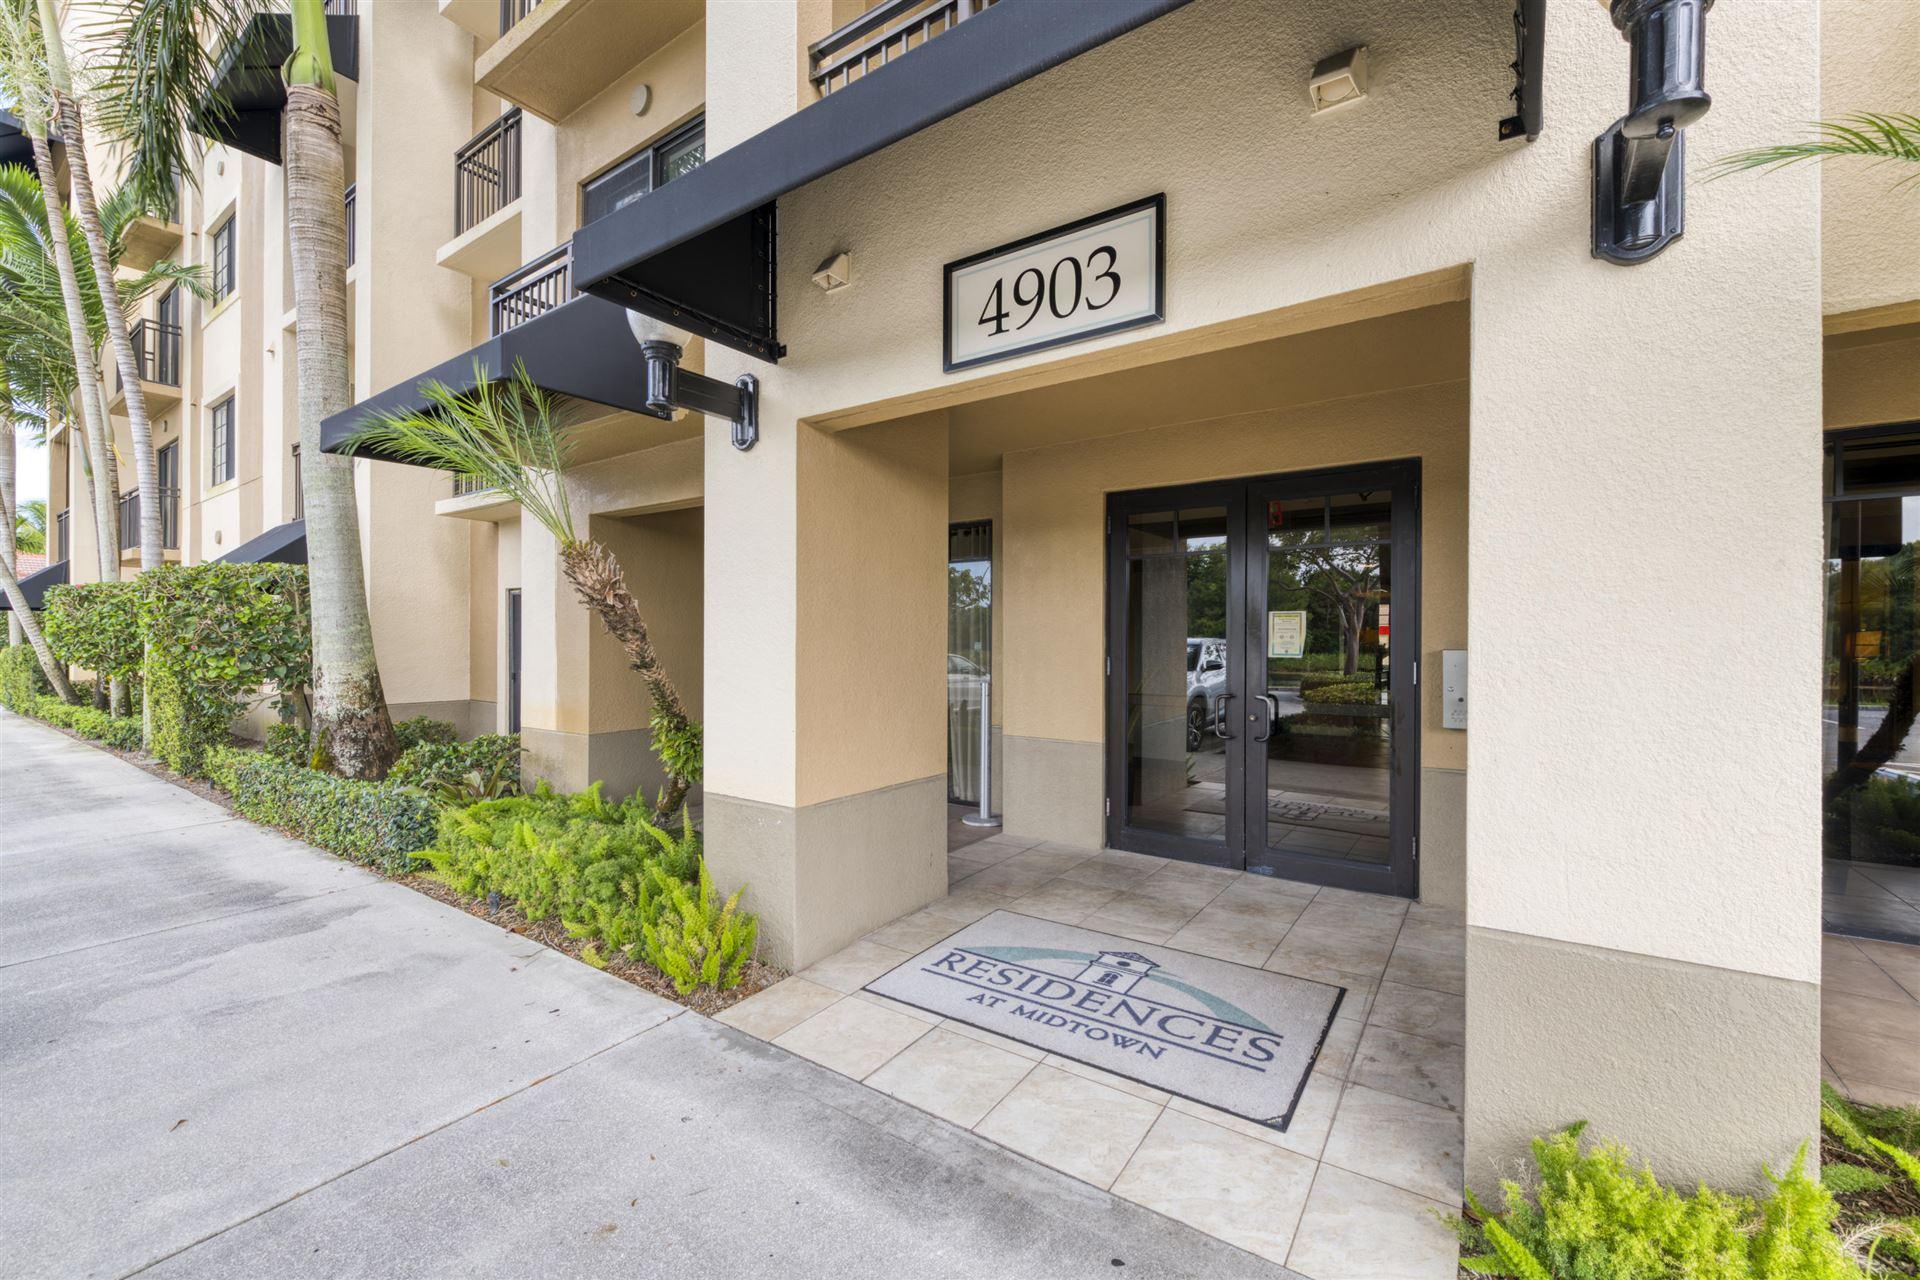 4903 Midtown Lane #3421, Palm Beach Gardens, FL 33418 - #: RX-10636502